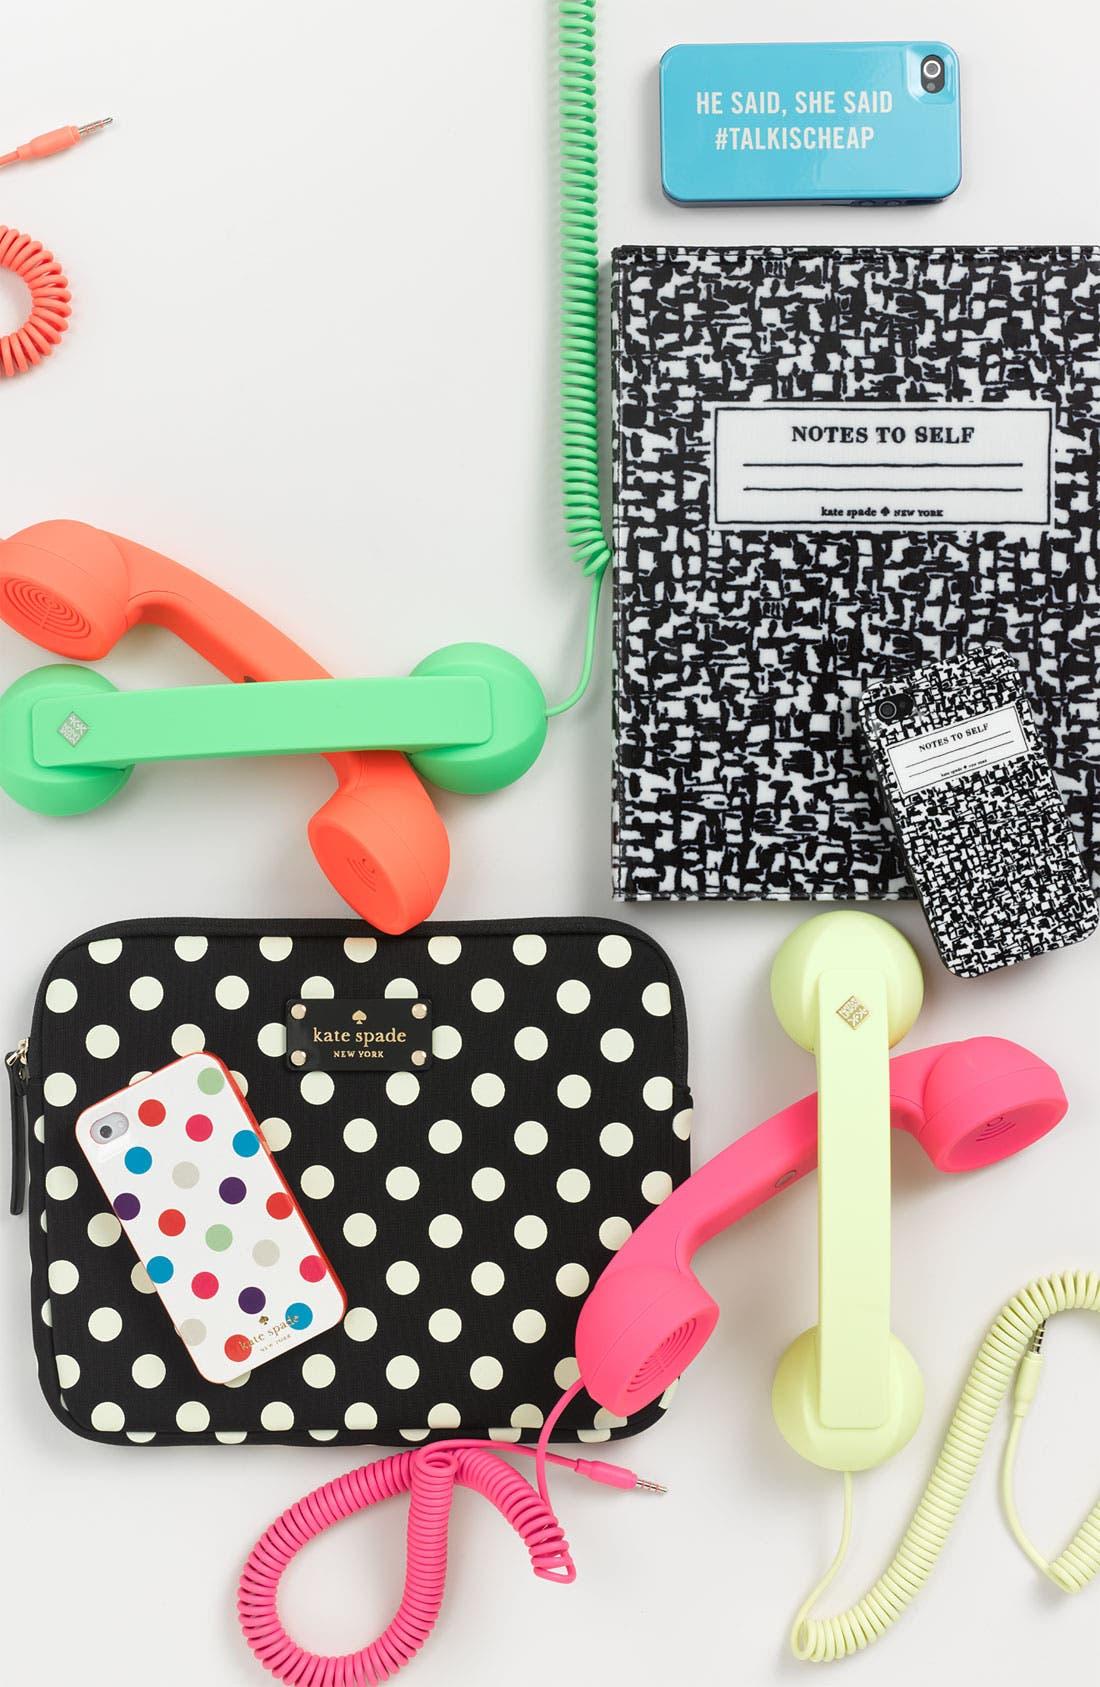 NATIVE UNION 'Neon Pop Phone' Handset, Main, color, 320